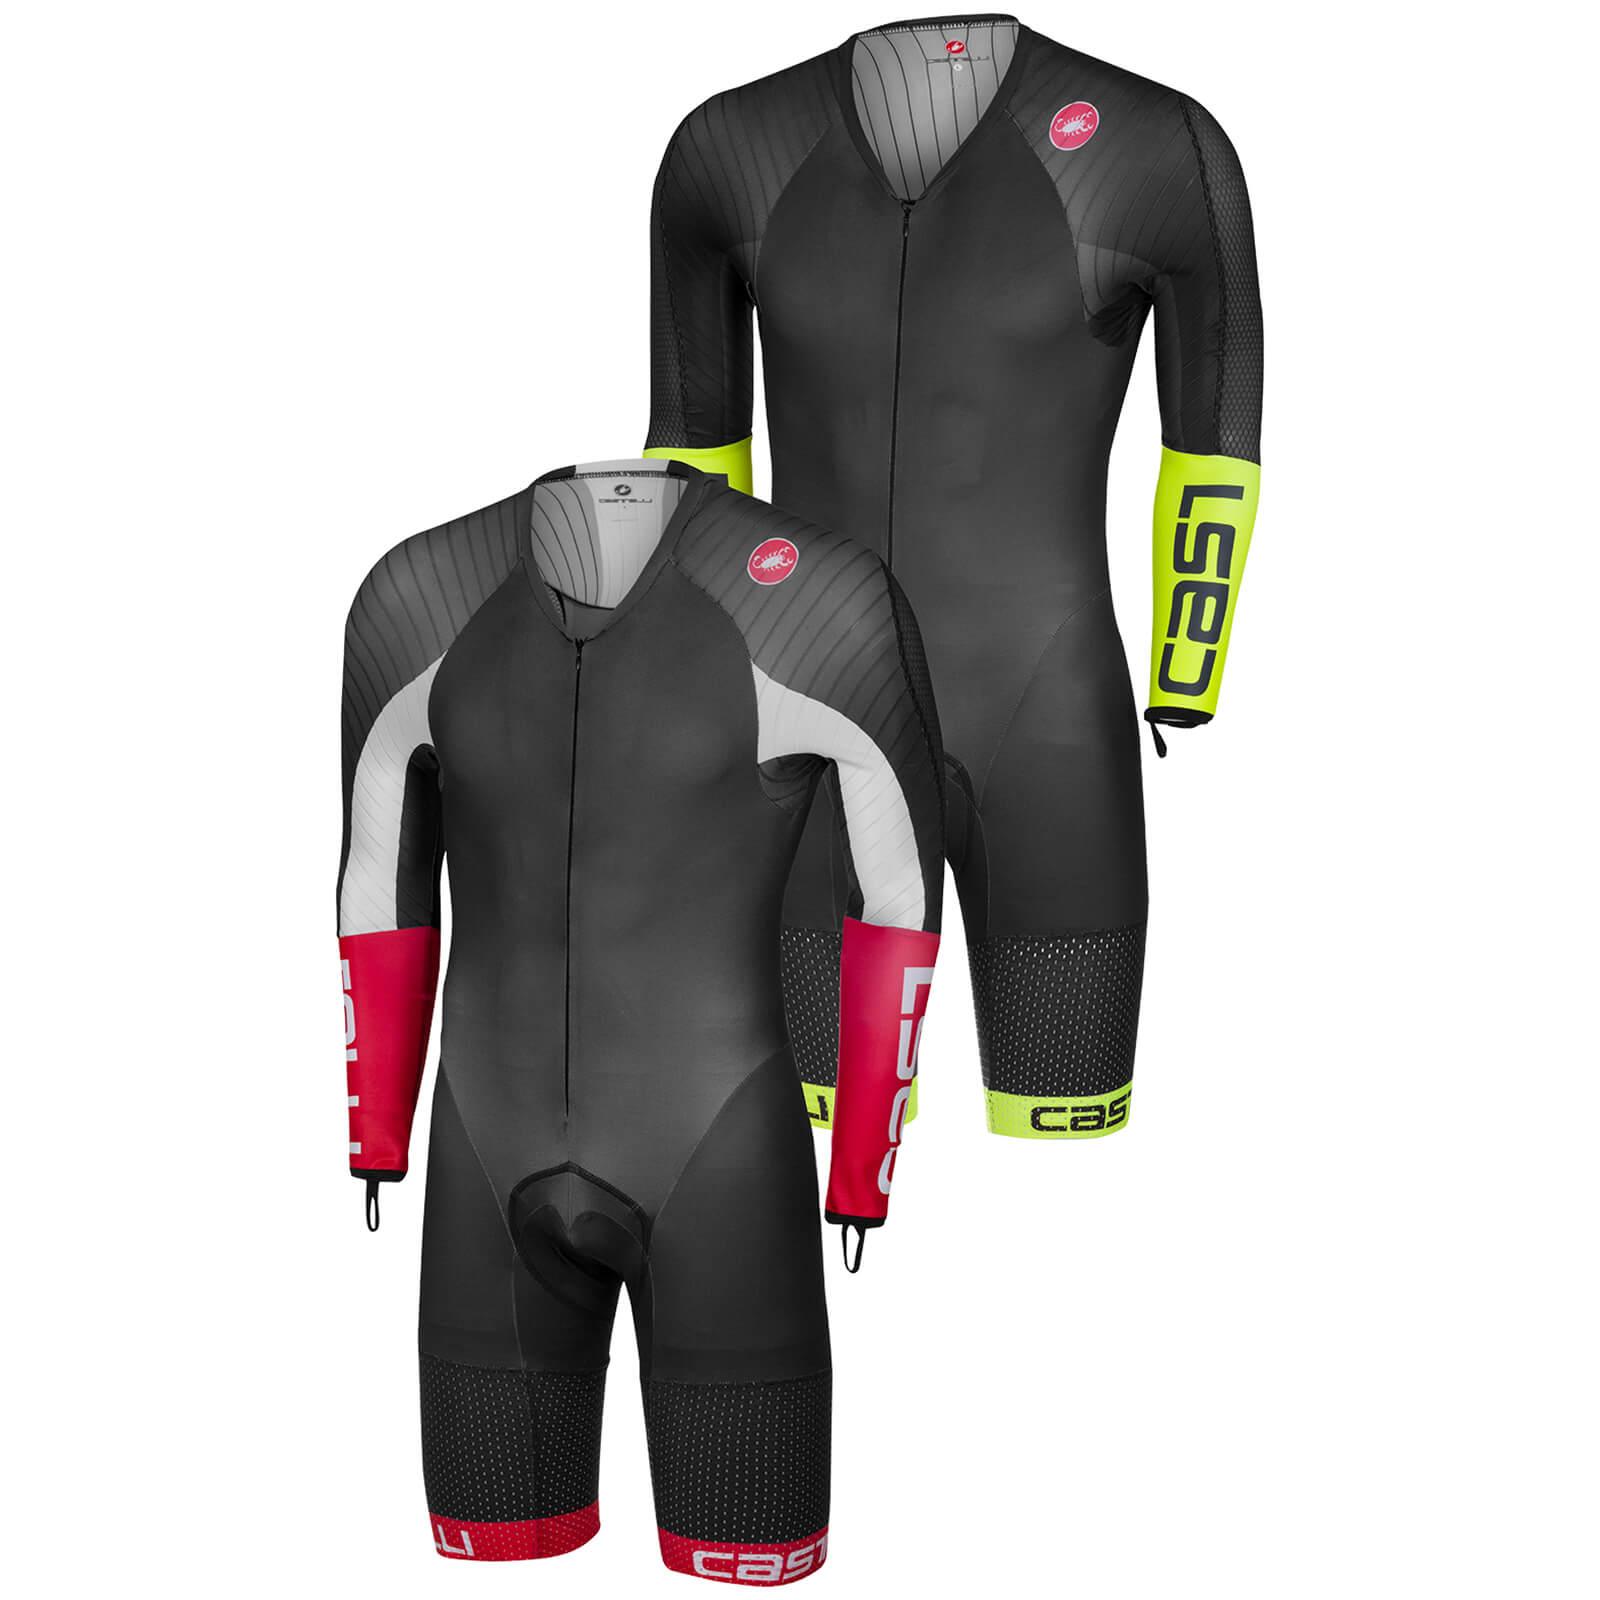 Castelli Body Paint 3 3 Speed Suit Probikekit Uk